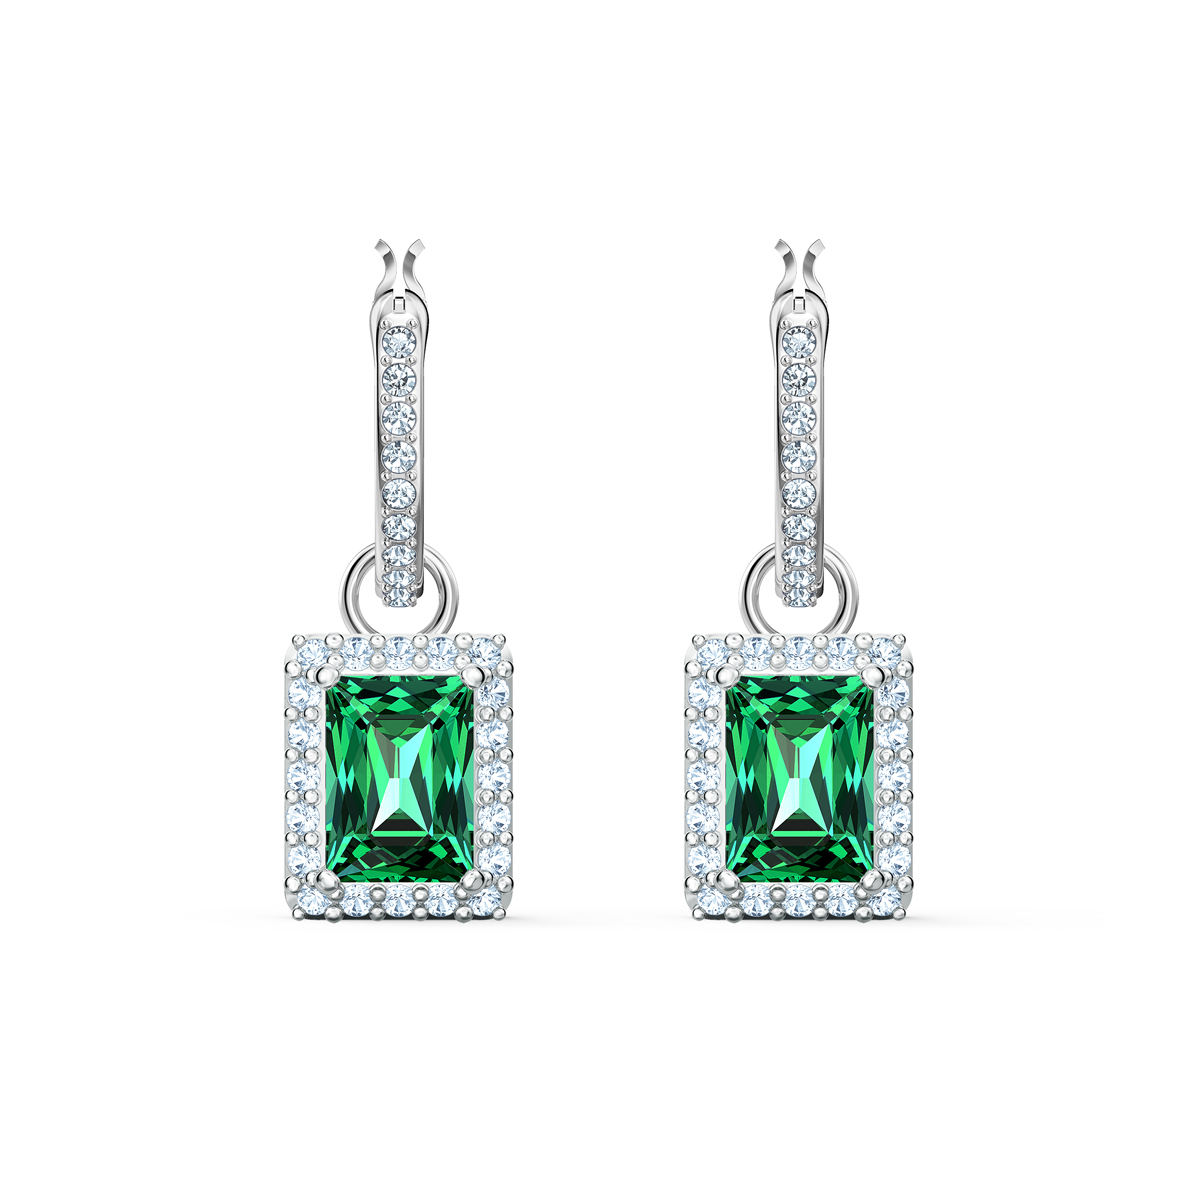 Swarovski Angelic Rectangular Pierced Earrings, Green, Rhodium Plated